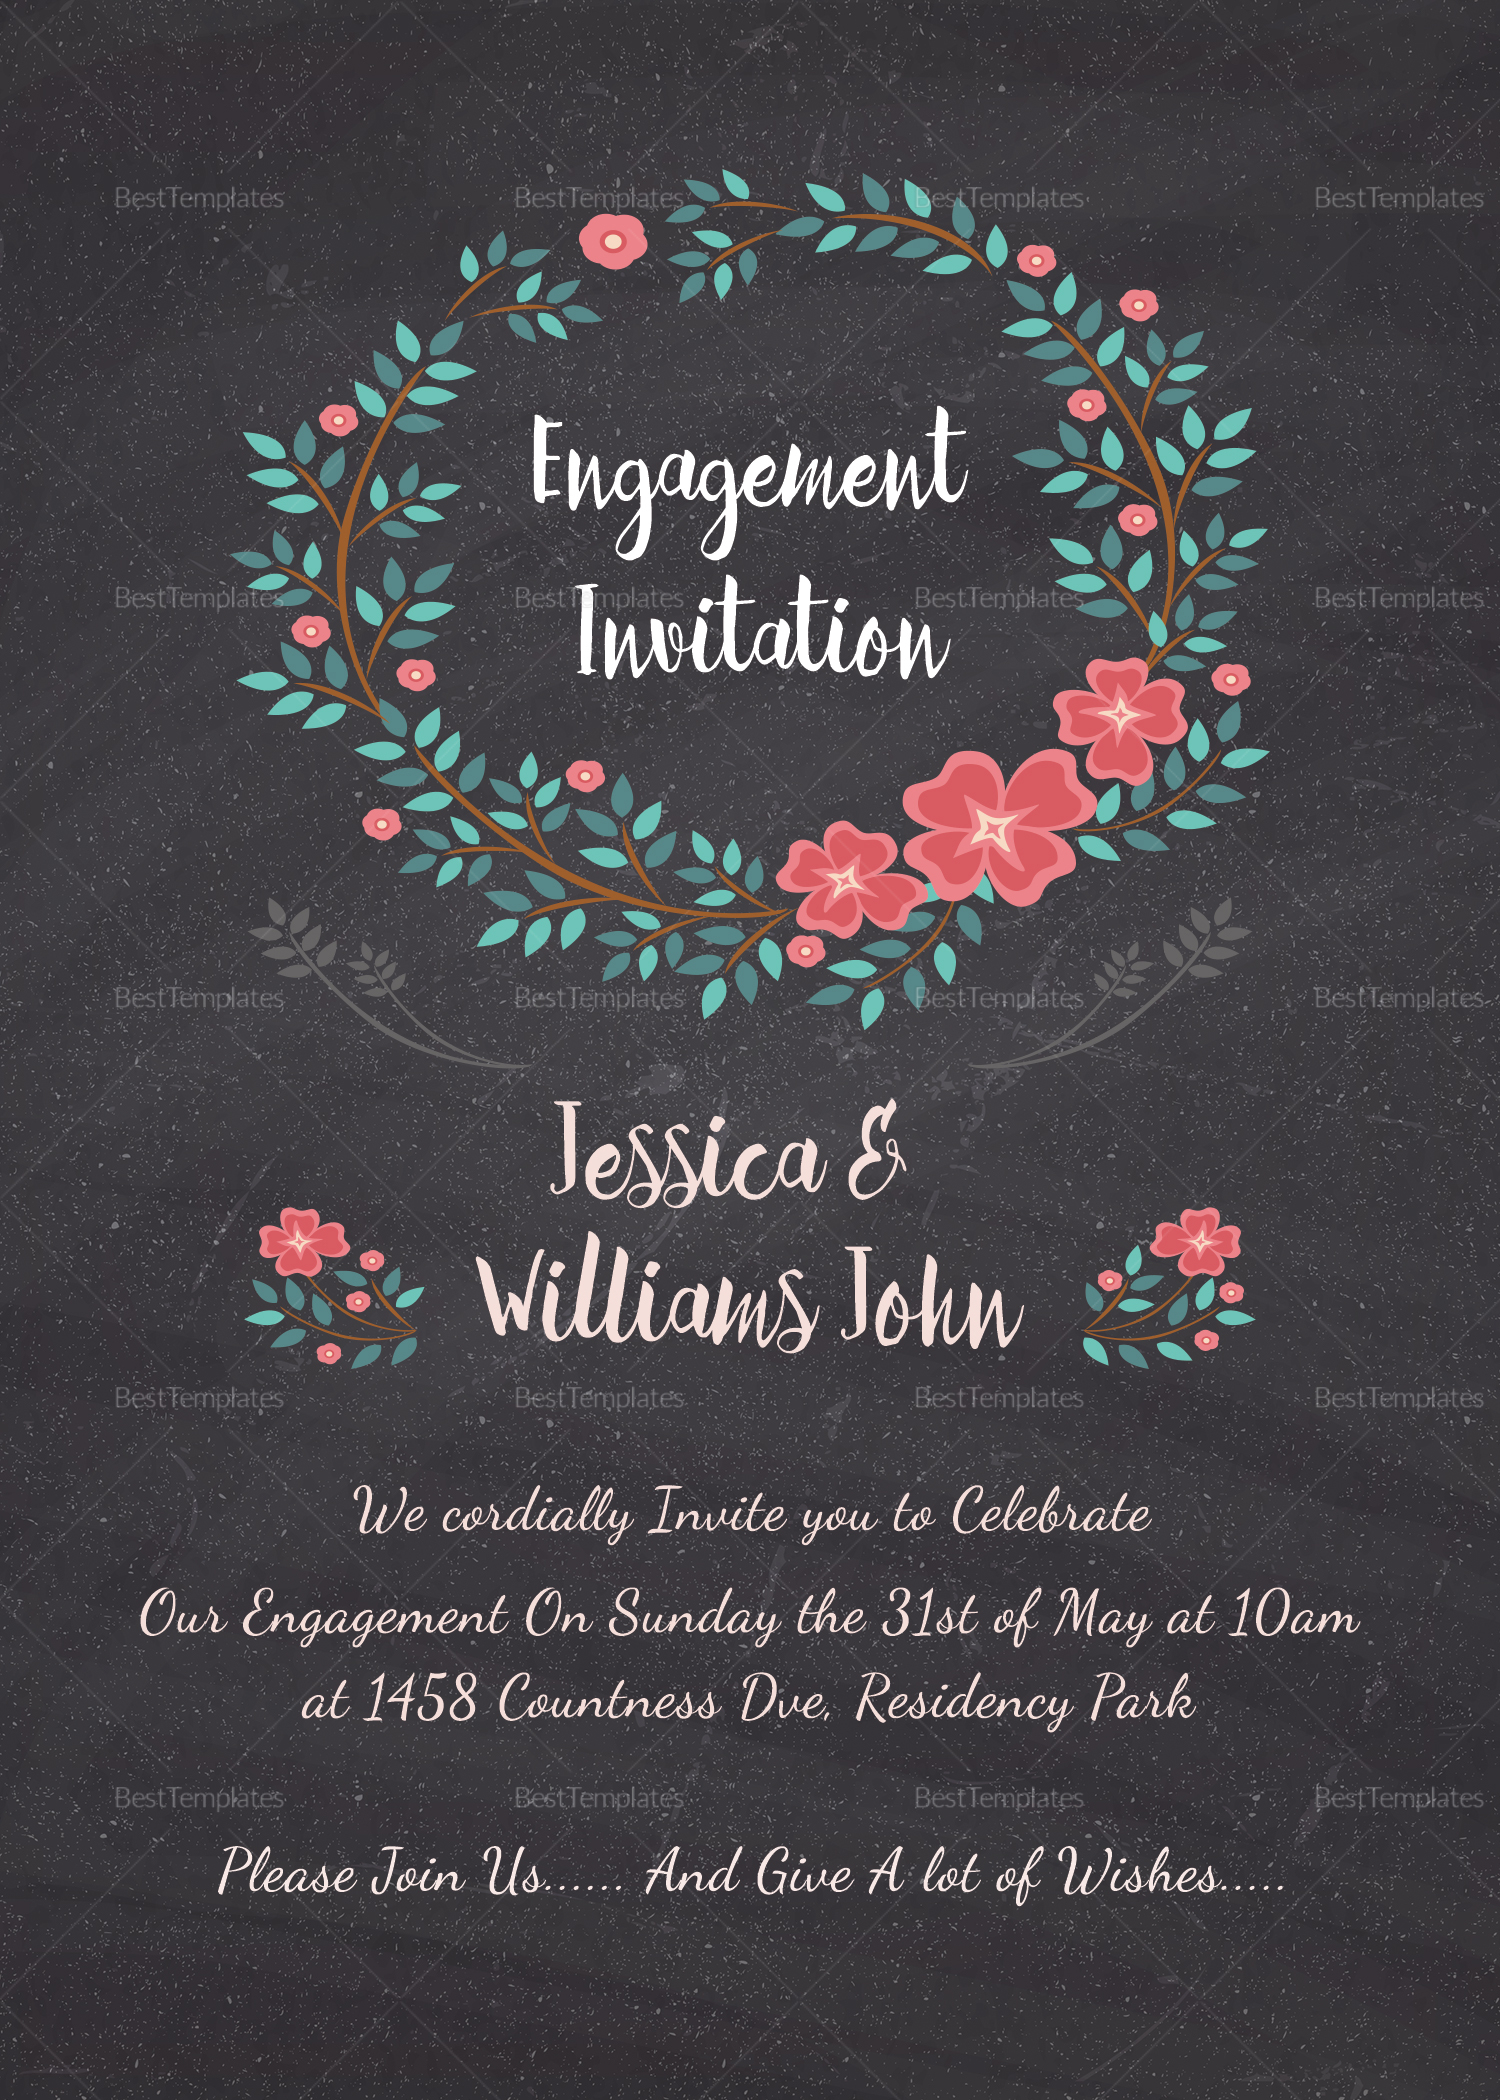 enagagement invitations